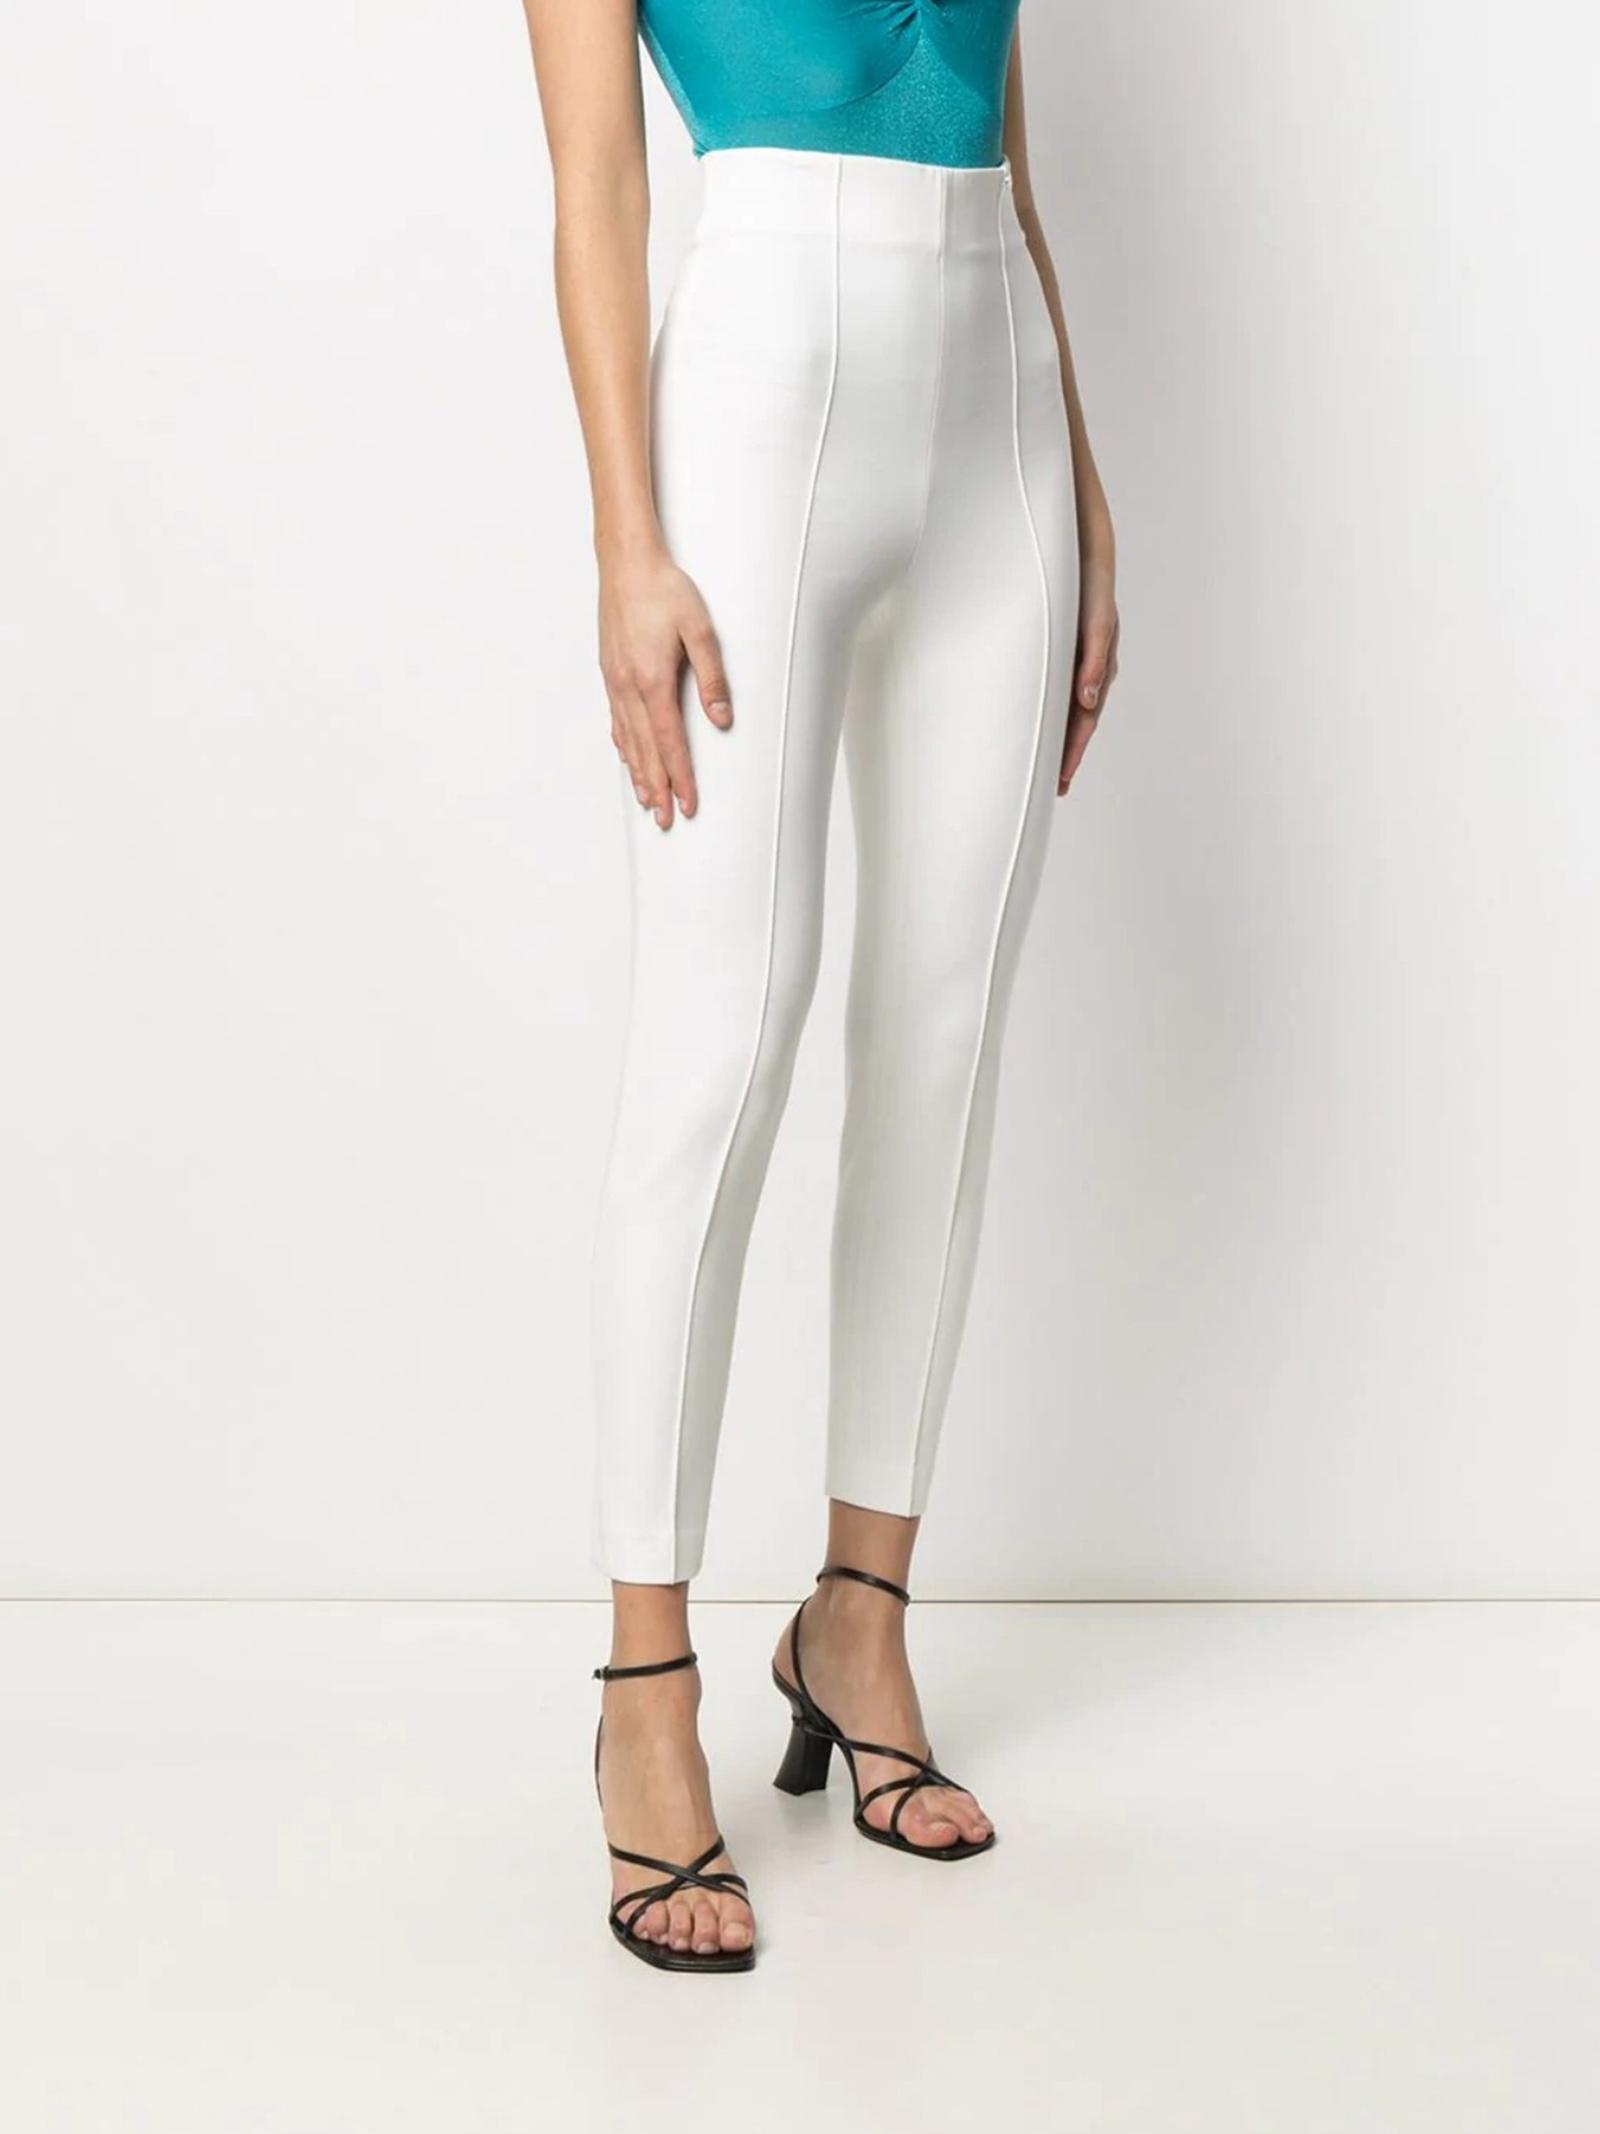 pantalone skinny liu jo LIU JO | Pantalone | CA1114J1857X0256